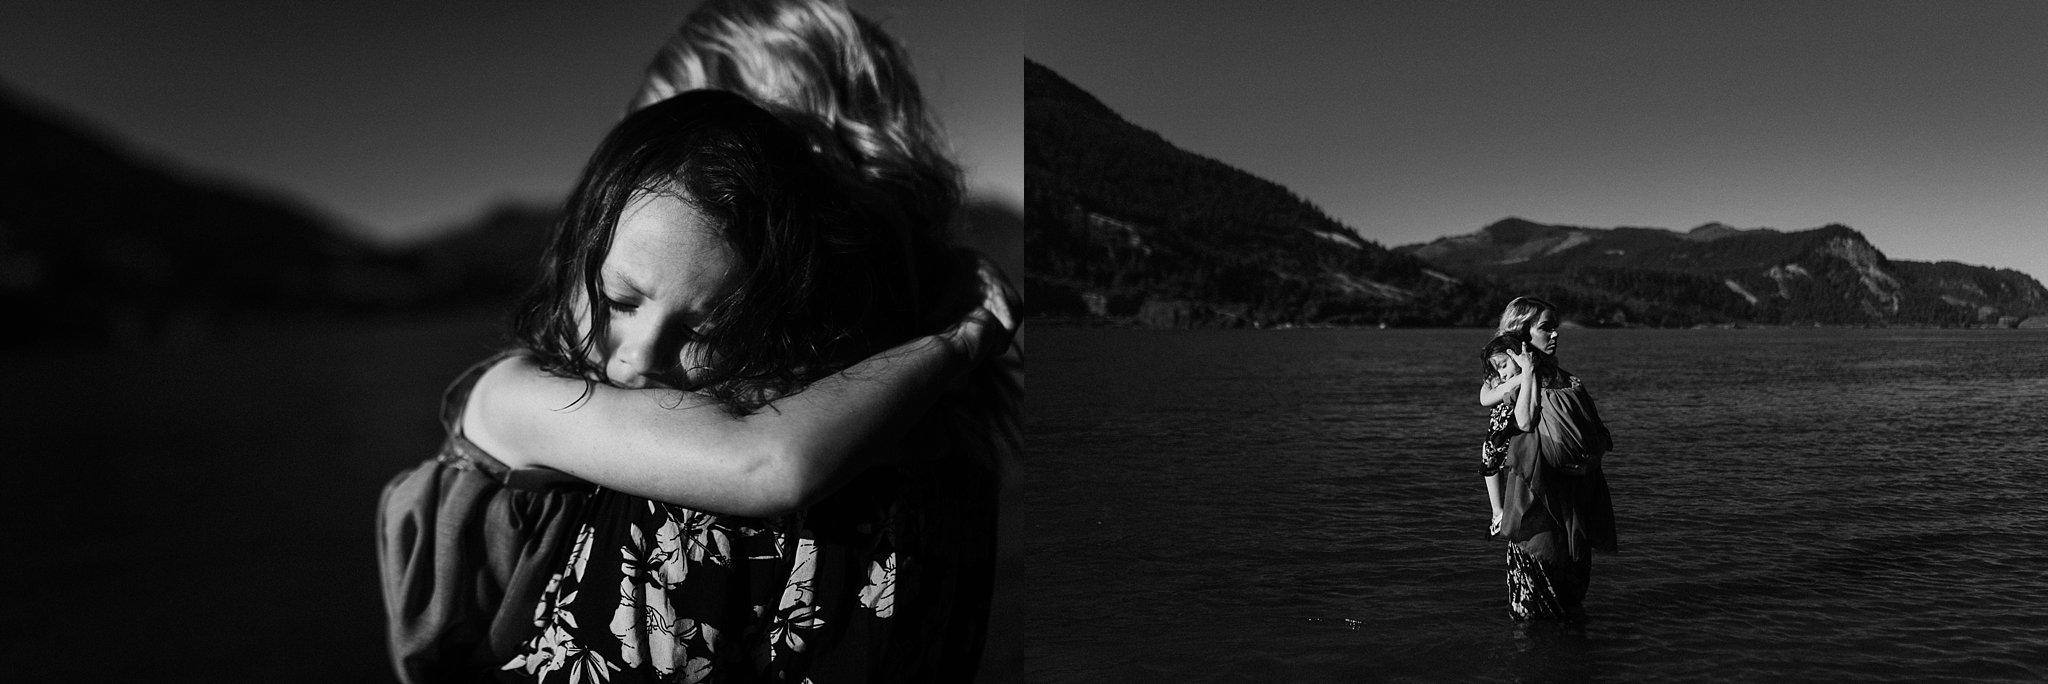 twyla jones photography - treasure coast florida - intimate couples session urban cowboy b&b | brooklyn New York_0060.jpg